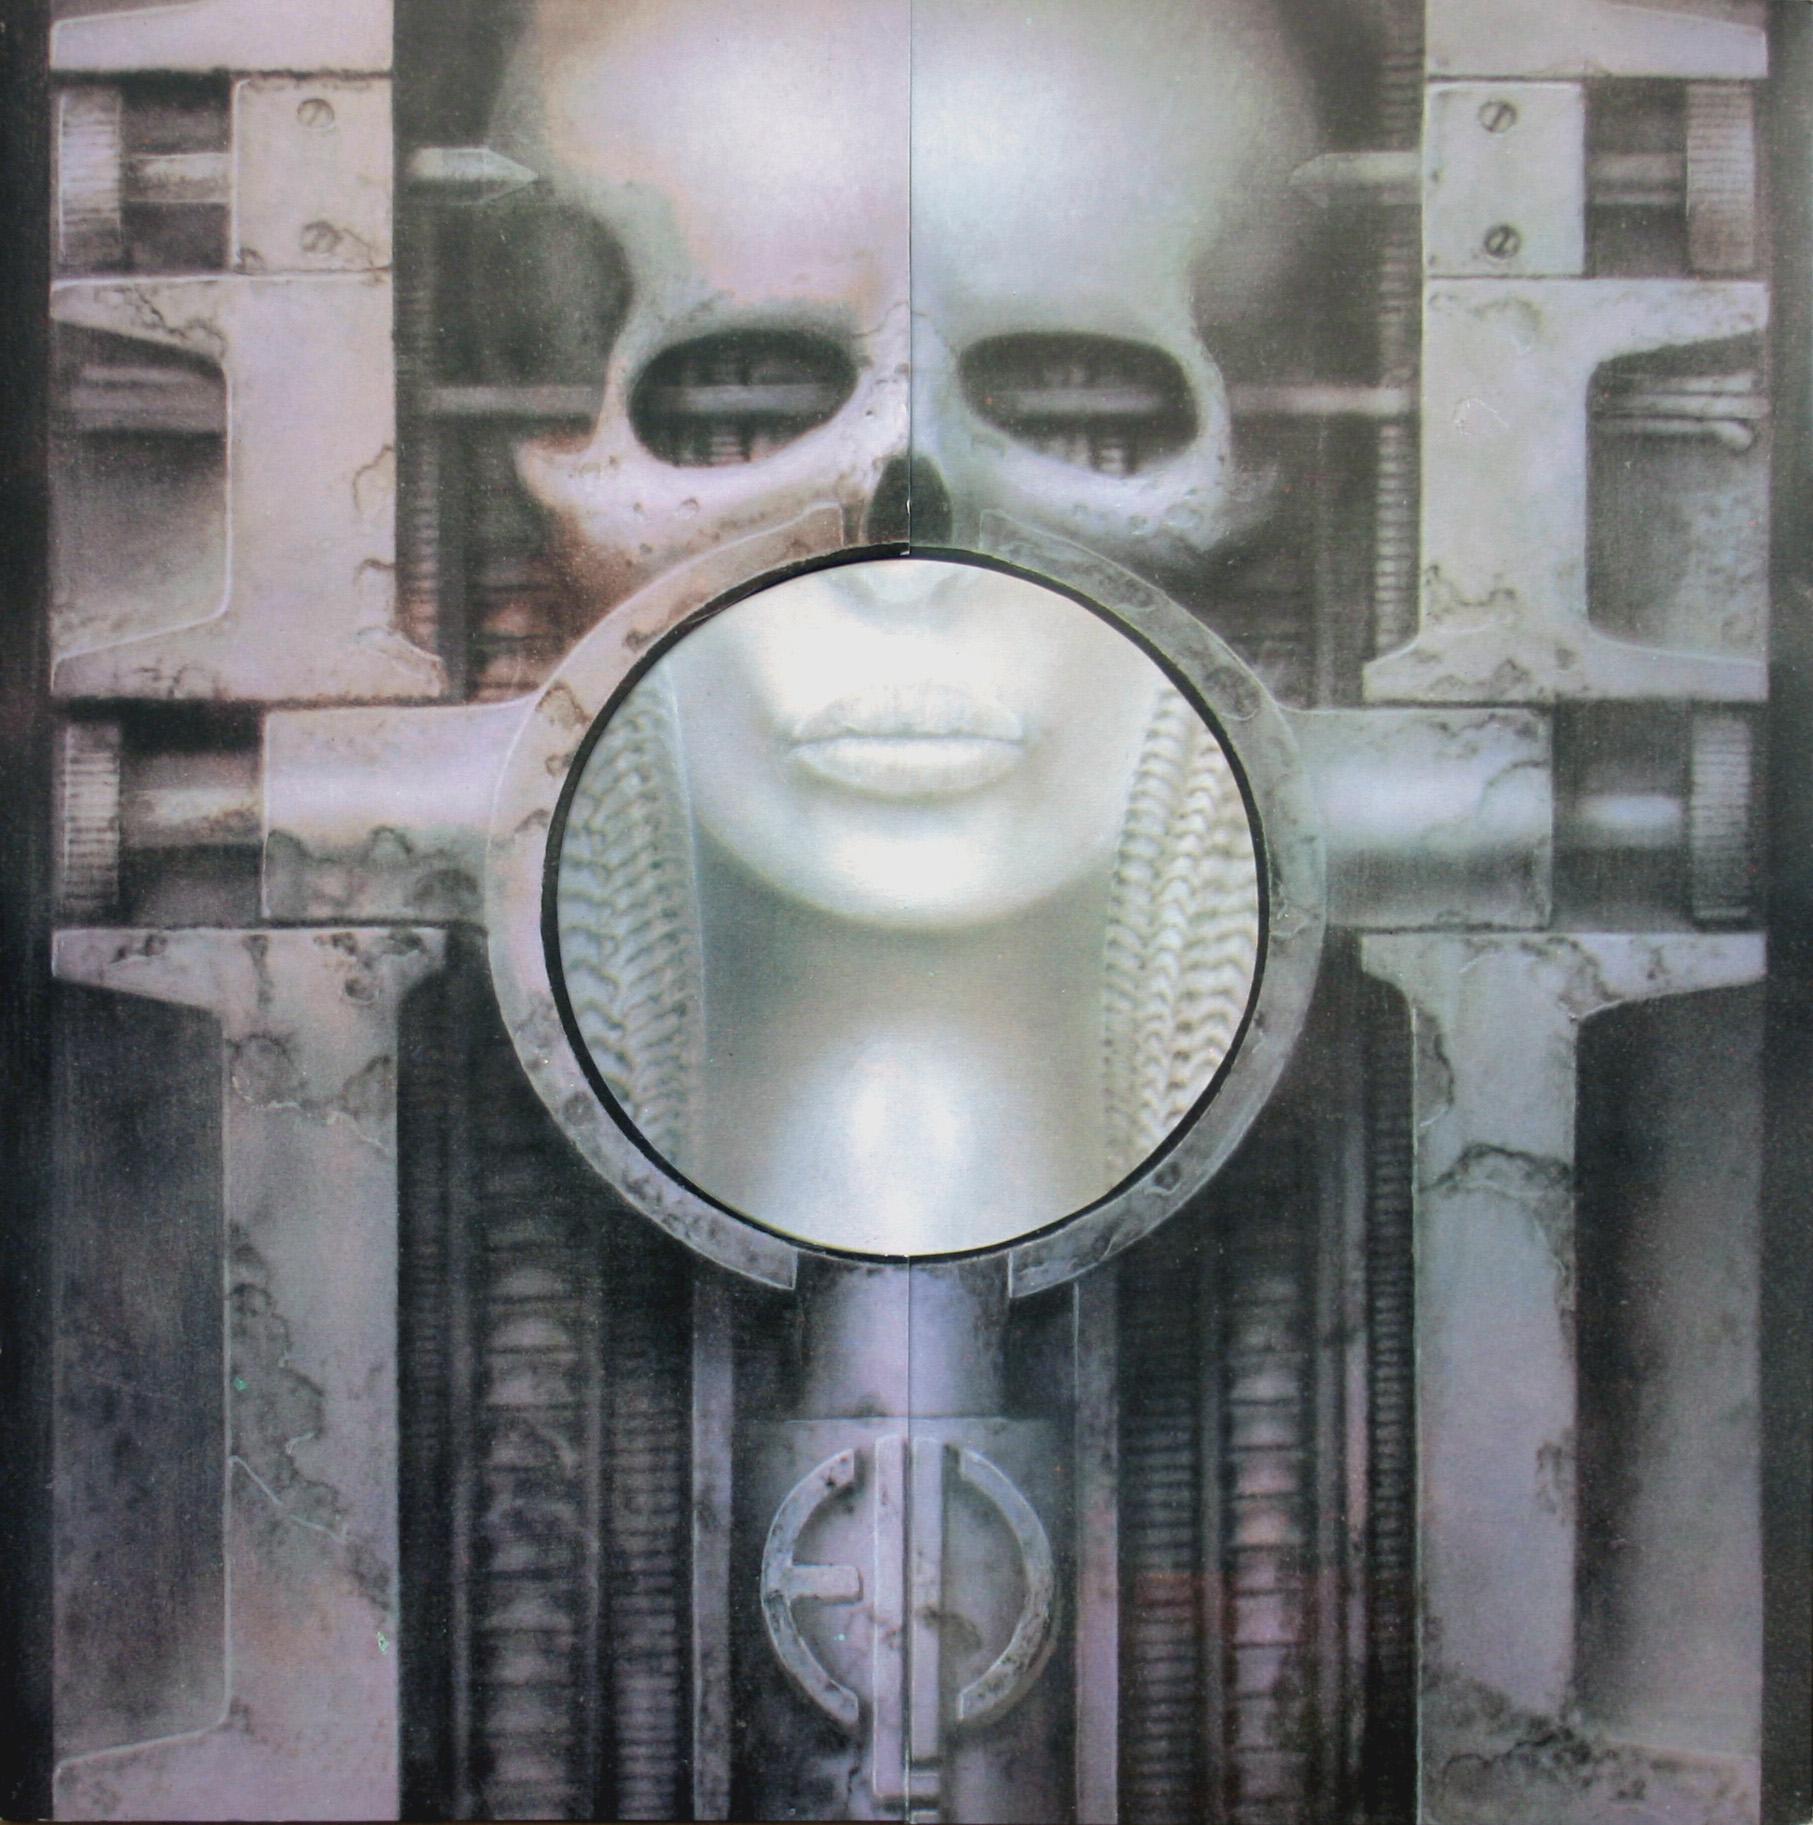 Apology Of Album Covers A Manifesto Queenvinyls Com